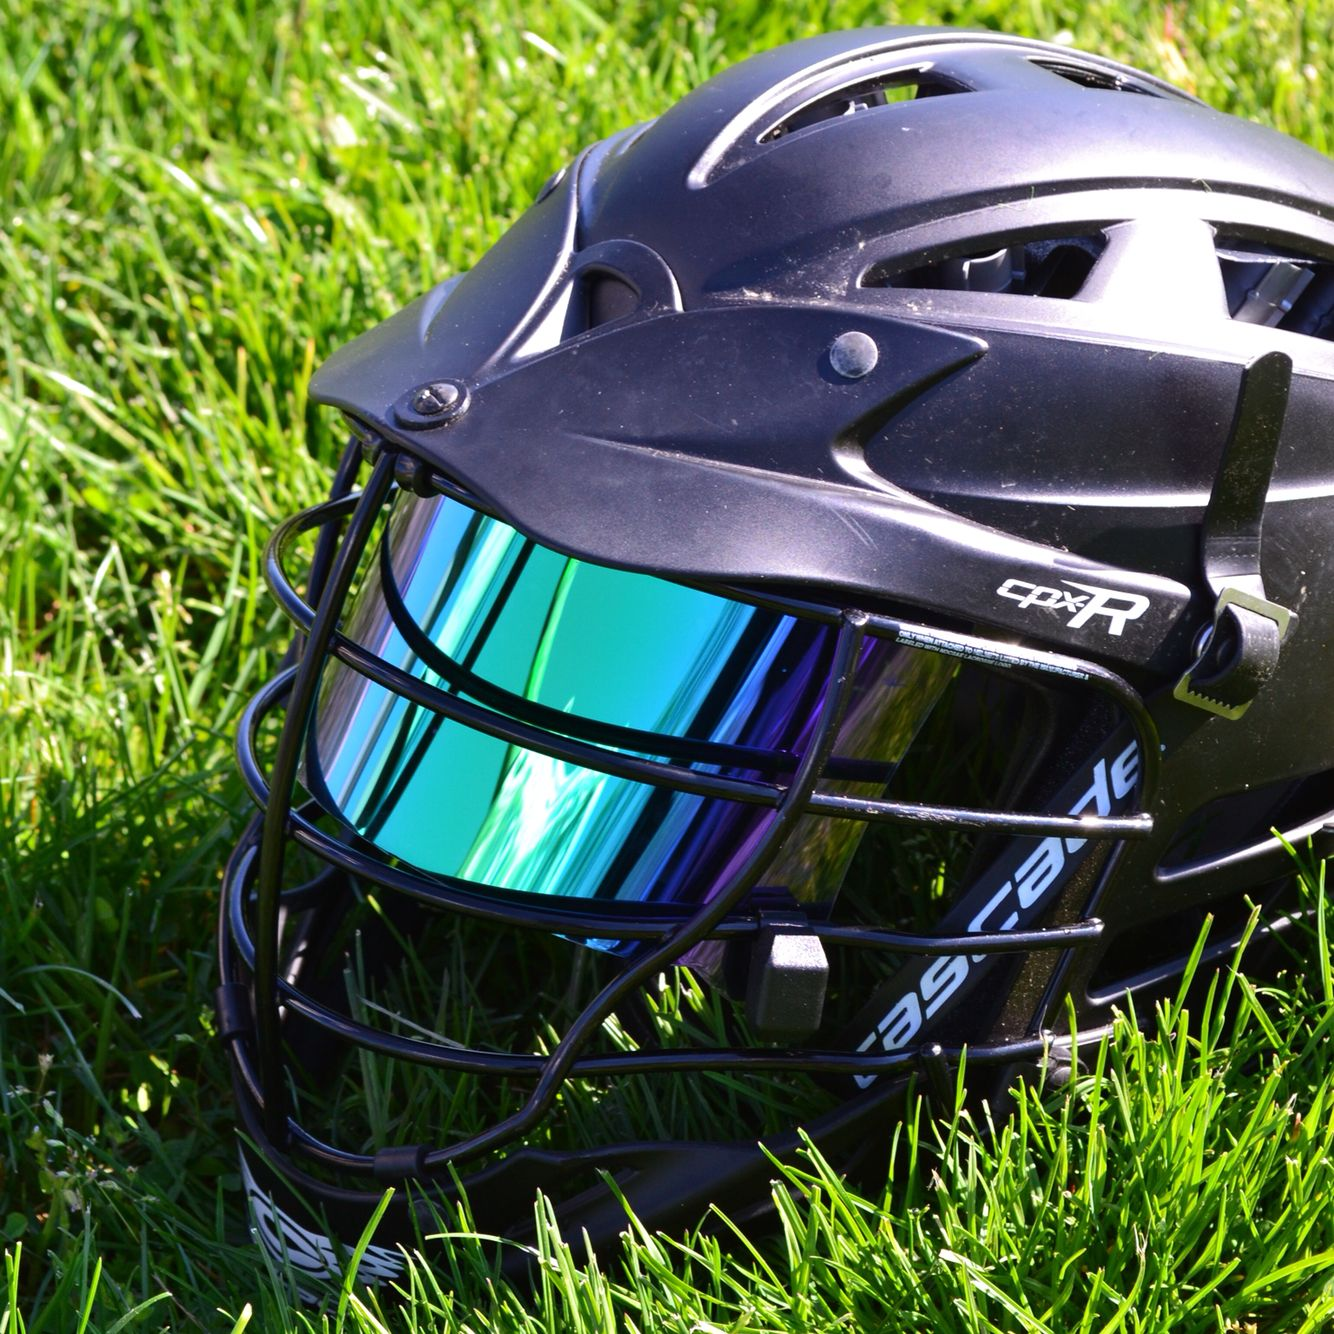 Great Looking Shot Of A Shoc Visor In A Cascade R Lacrosse Helmet Www Shocvisor Com Football Helmets Lacrosse Helmet Visor